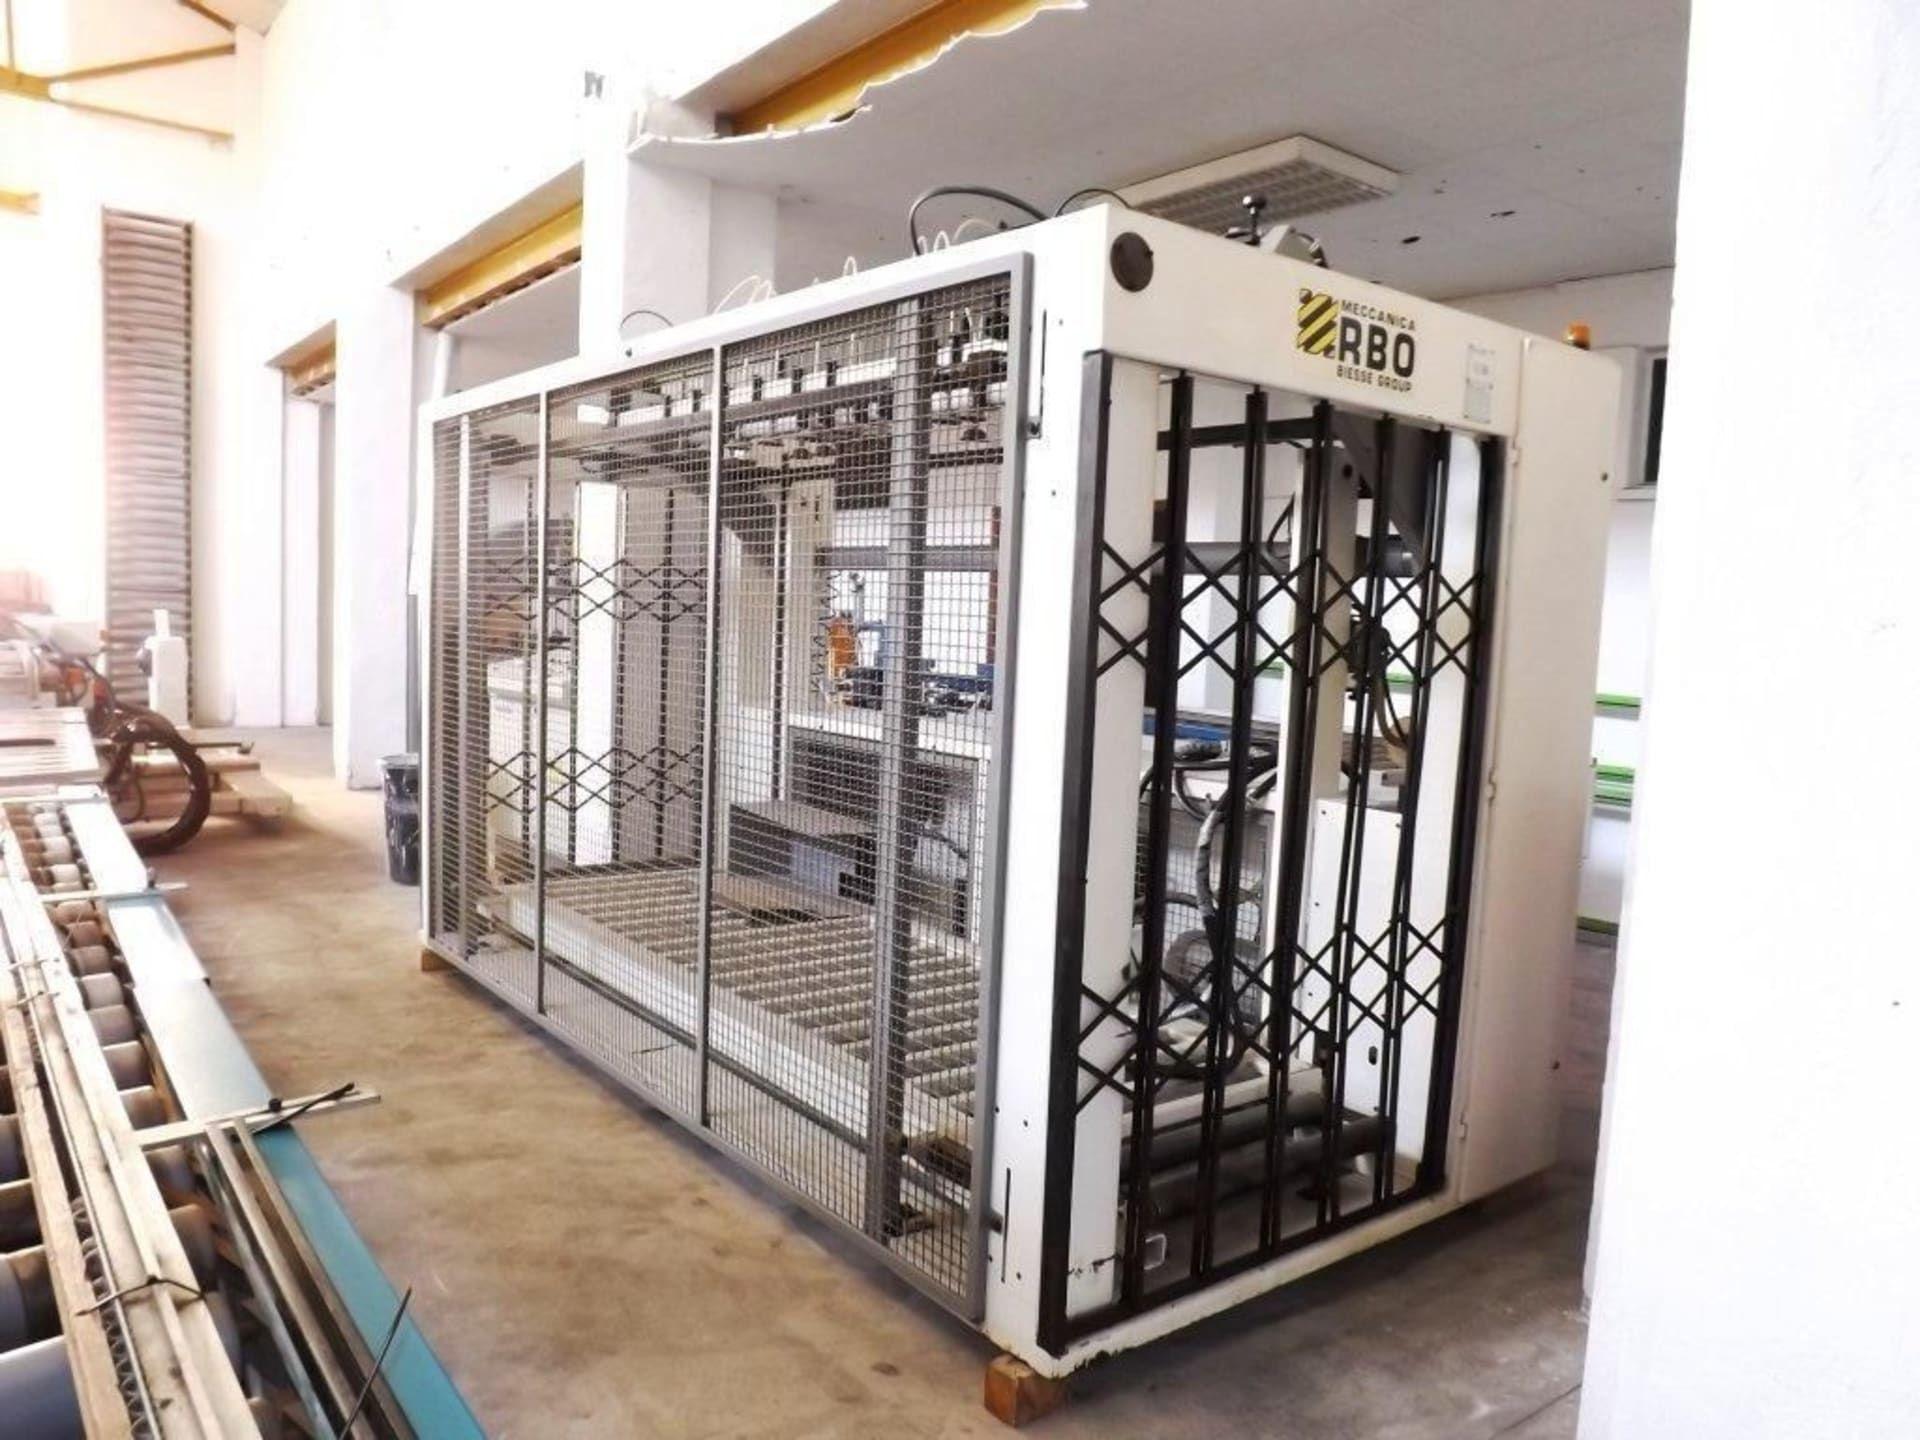 RBO TORNADO SC FE/1000 Be- und Entladestation